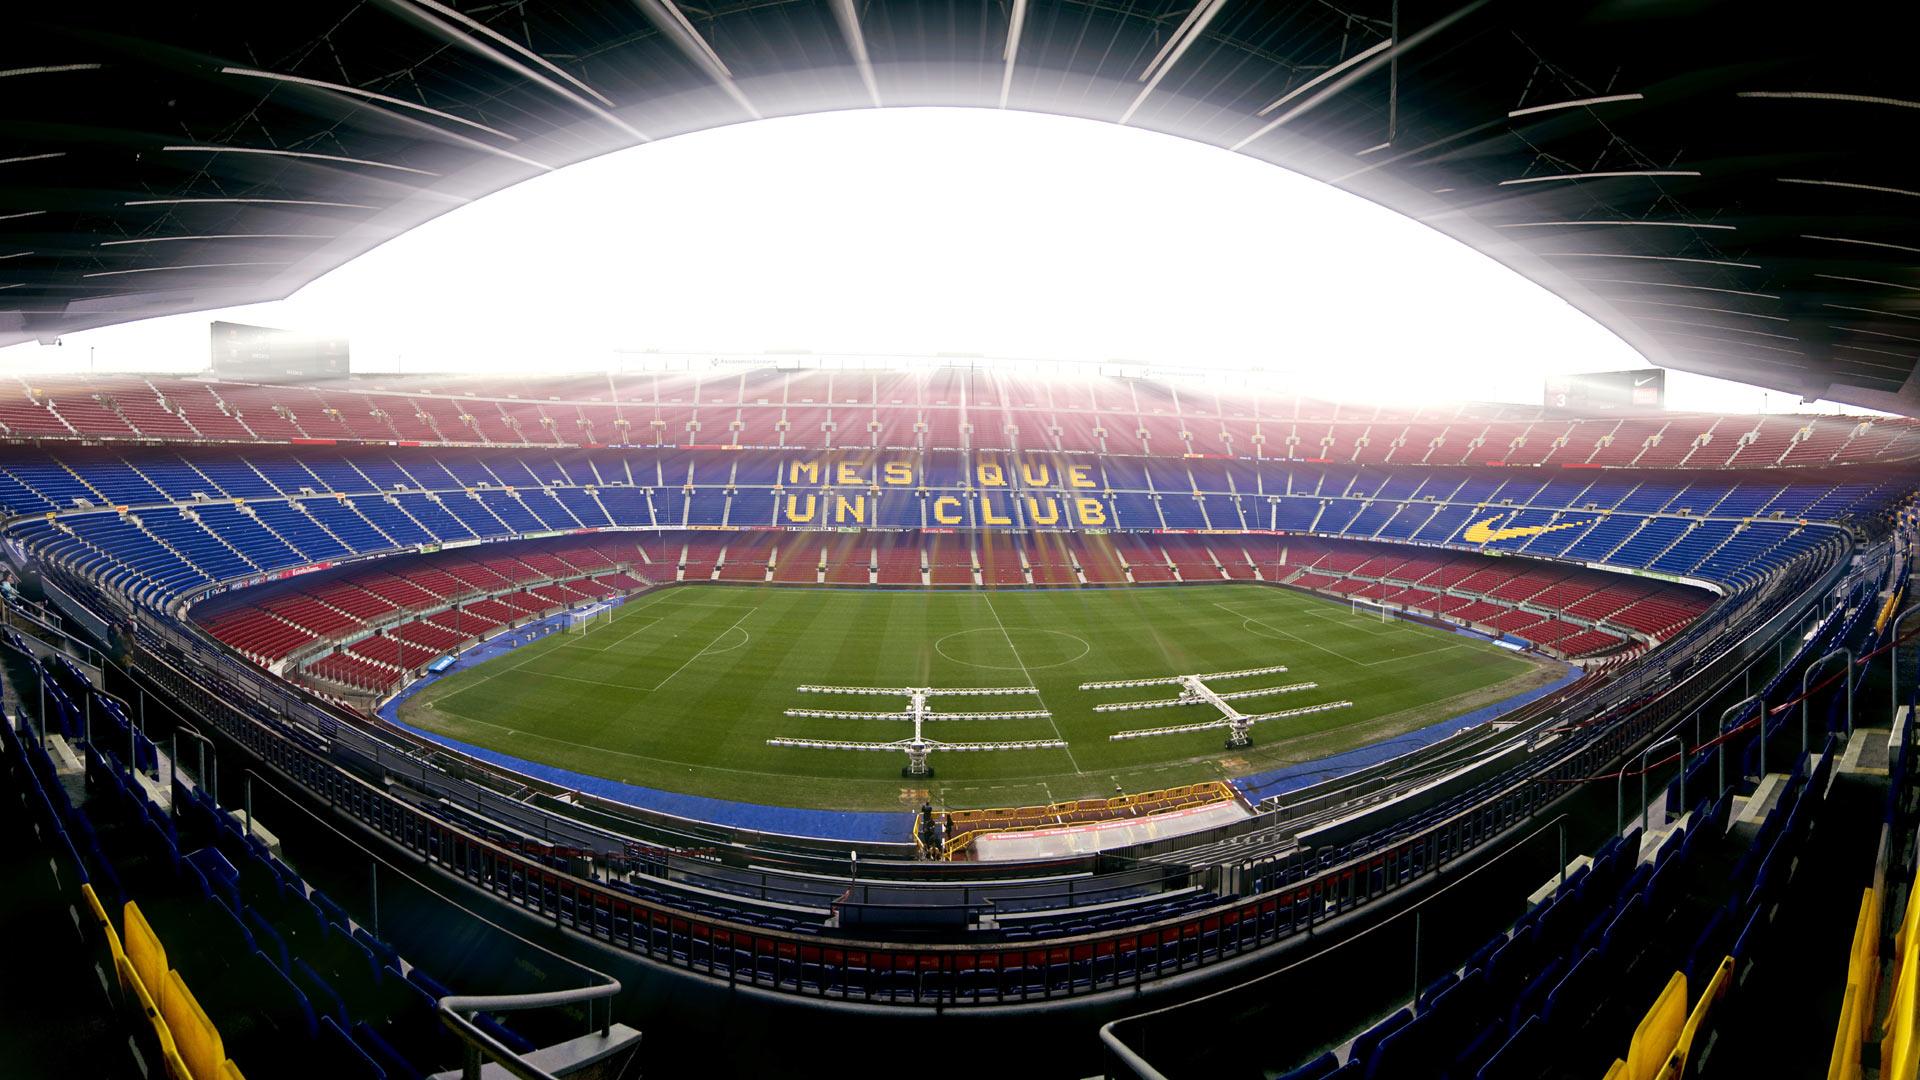 Barcelona Wallpaper Camp Nou Stadium 12679 Wallpaper 1920x1080